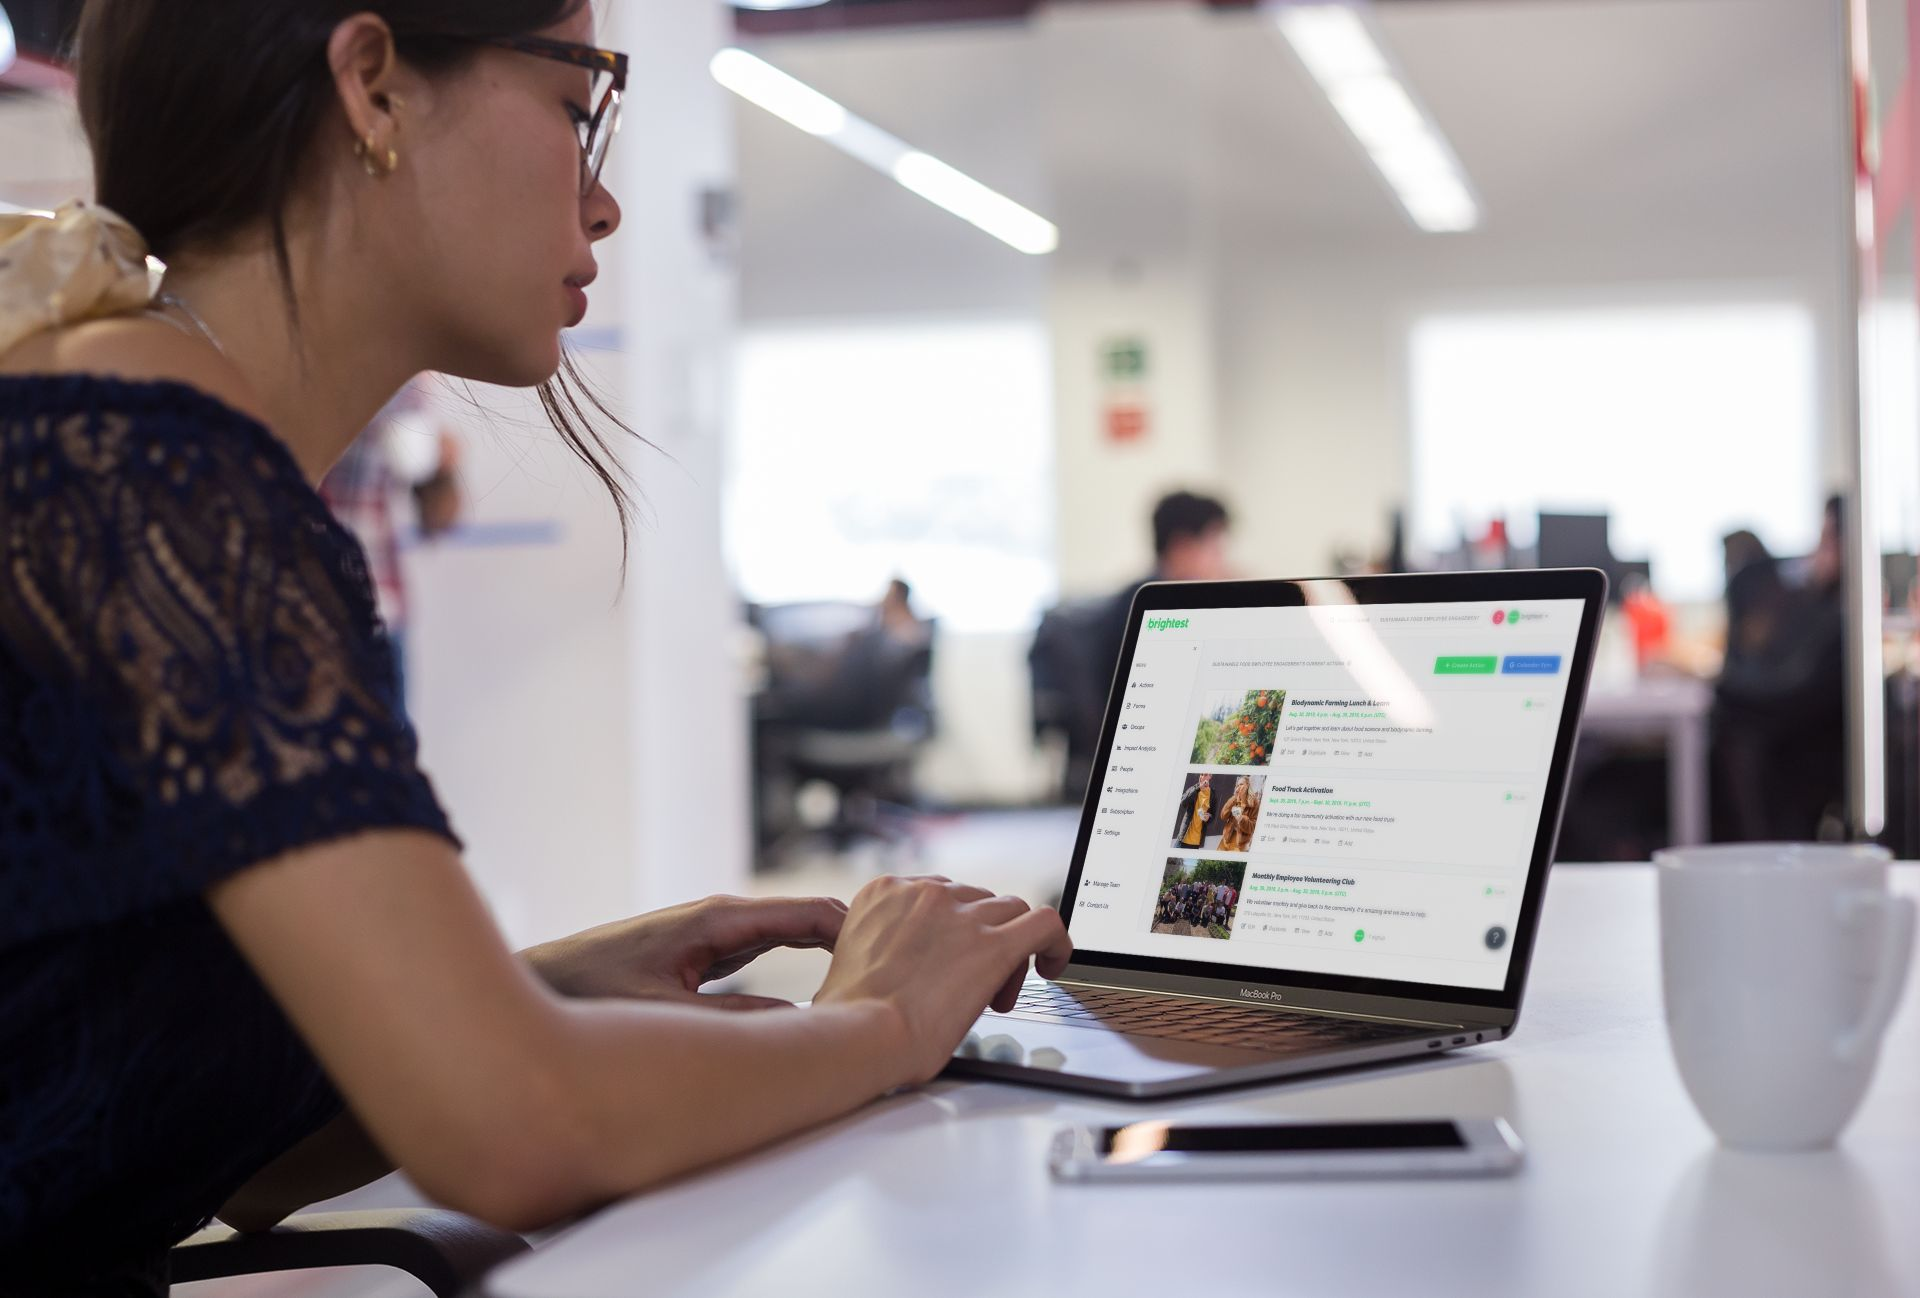 digital and community organizing software